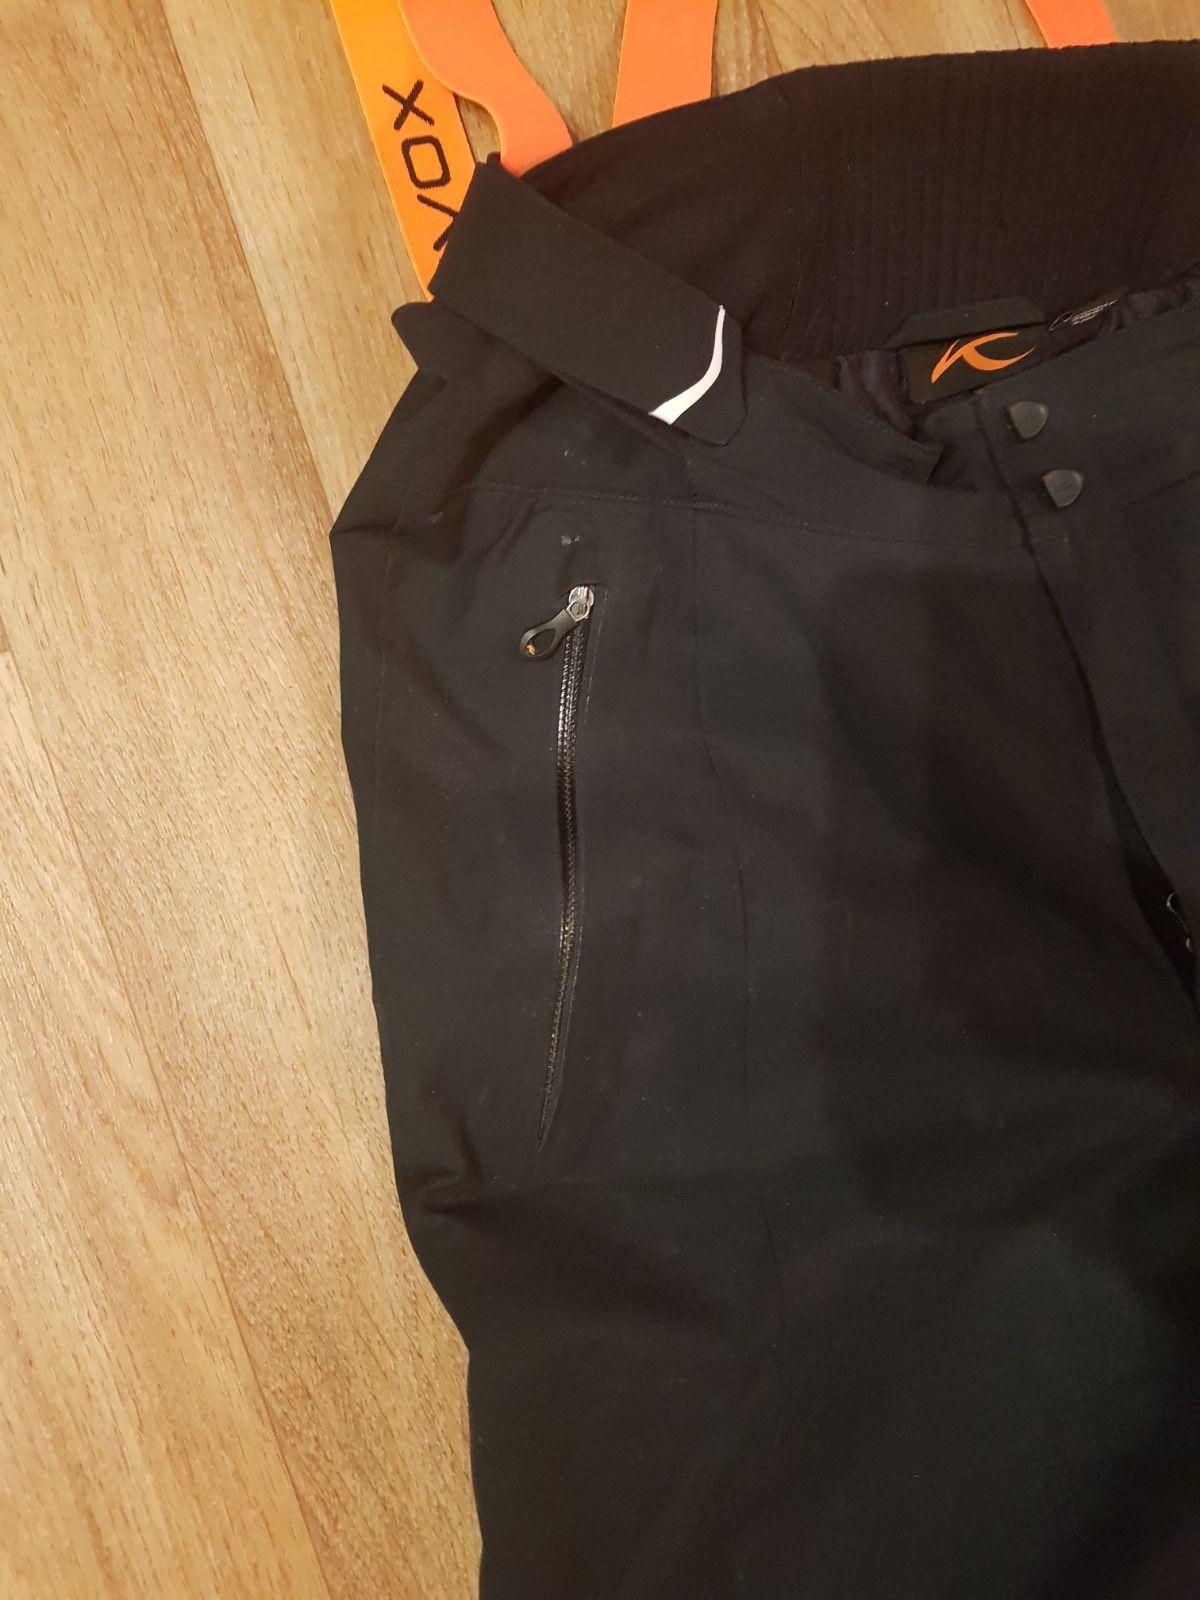 c2f92114b48 Lyzarske kalhoty KJUS vel. L 52 - Bazar - SNOW.CZ